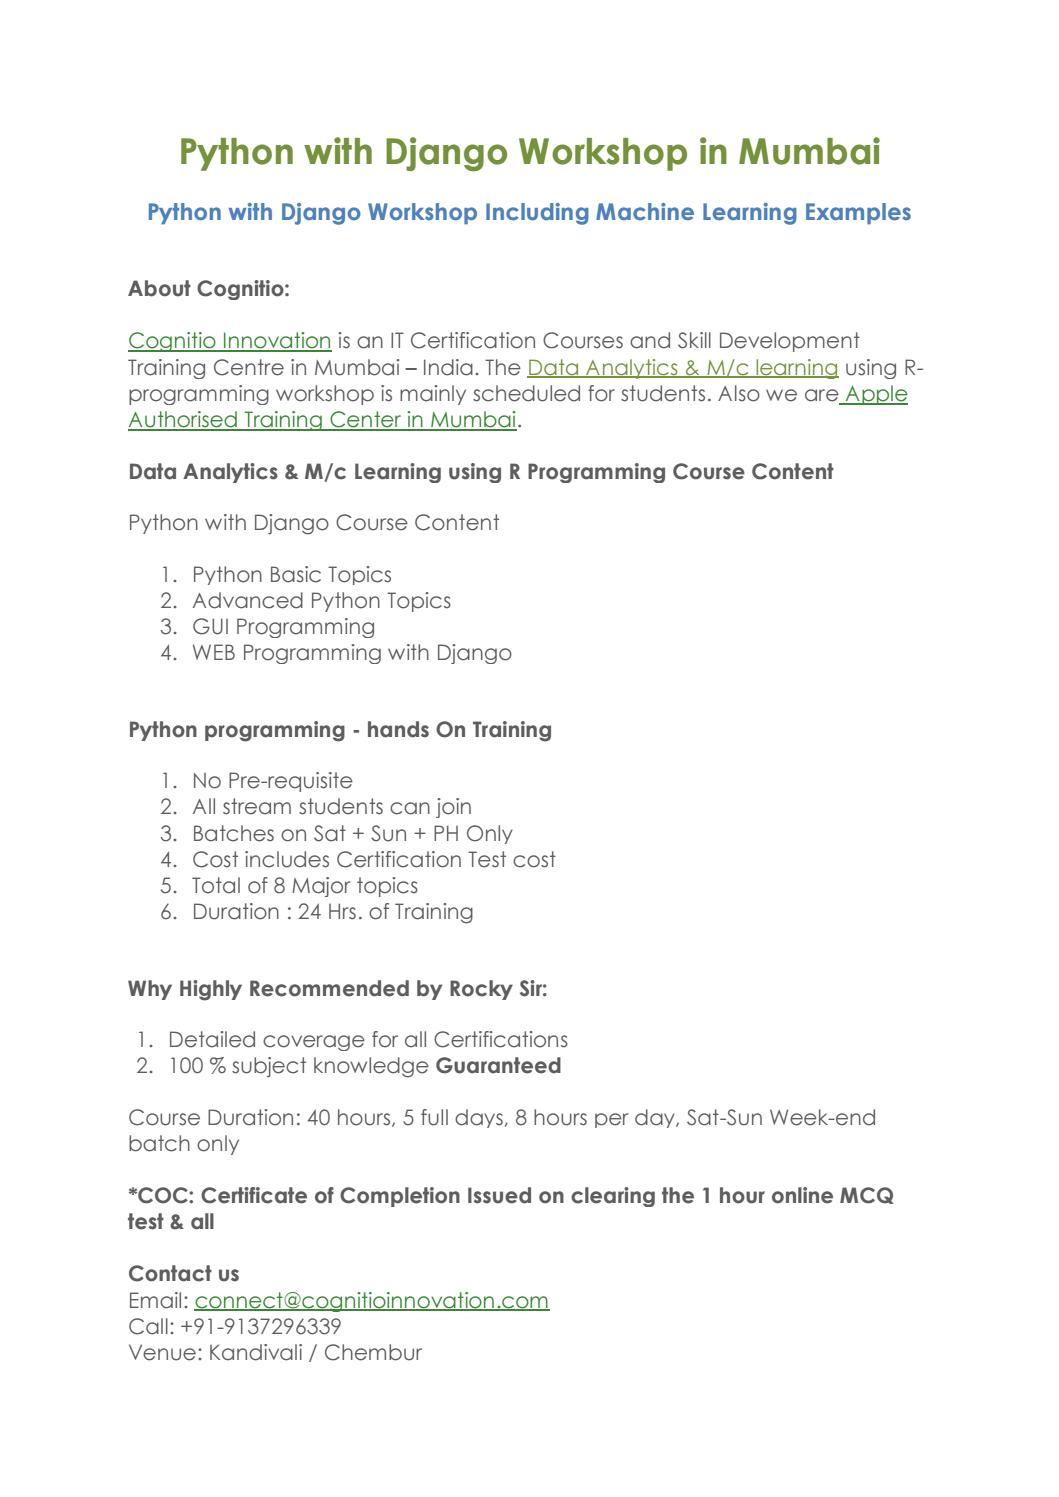 Python with Django Workshop in Mumbai - Cognitio Innovation